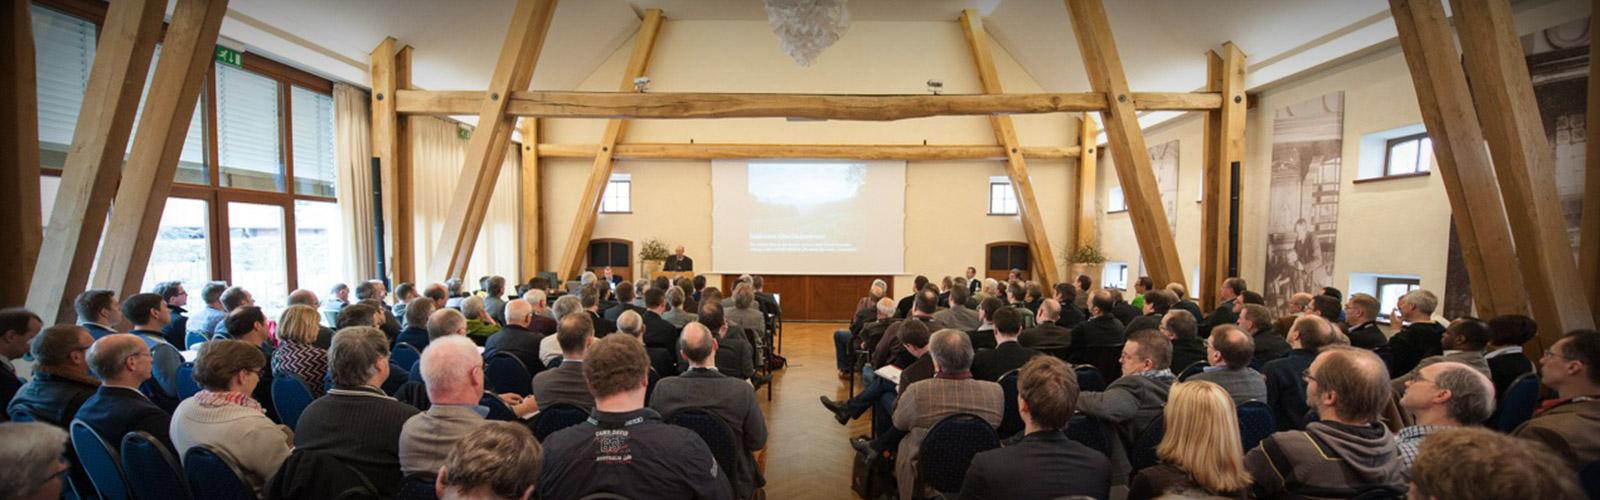 Endoprothetik Forum | Vortrag